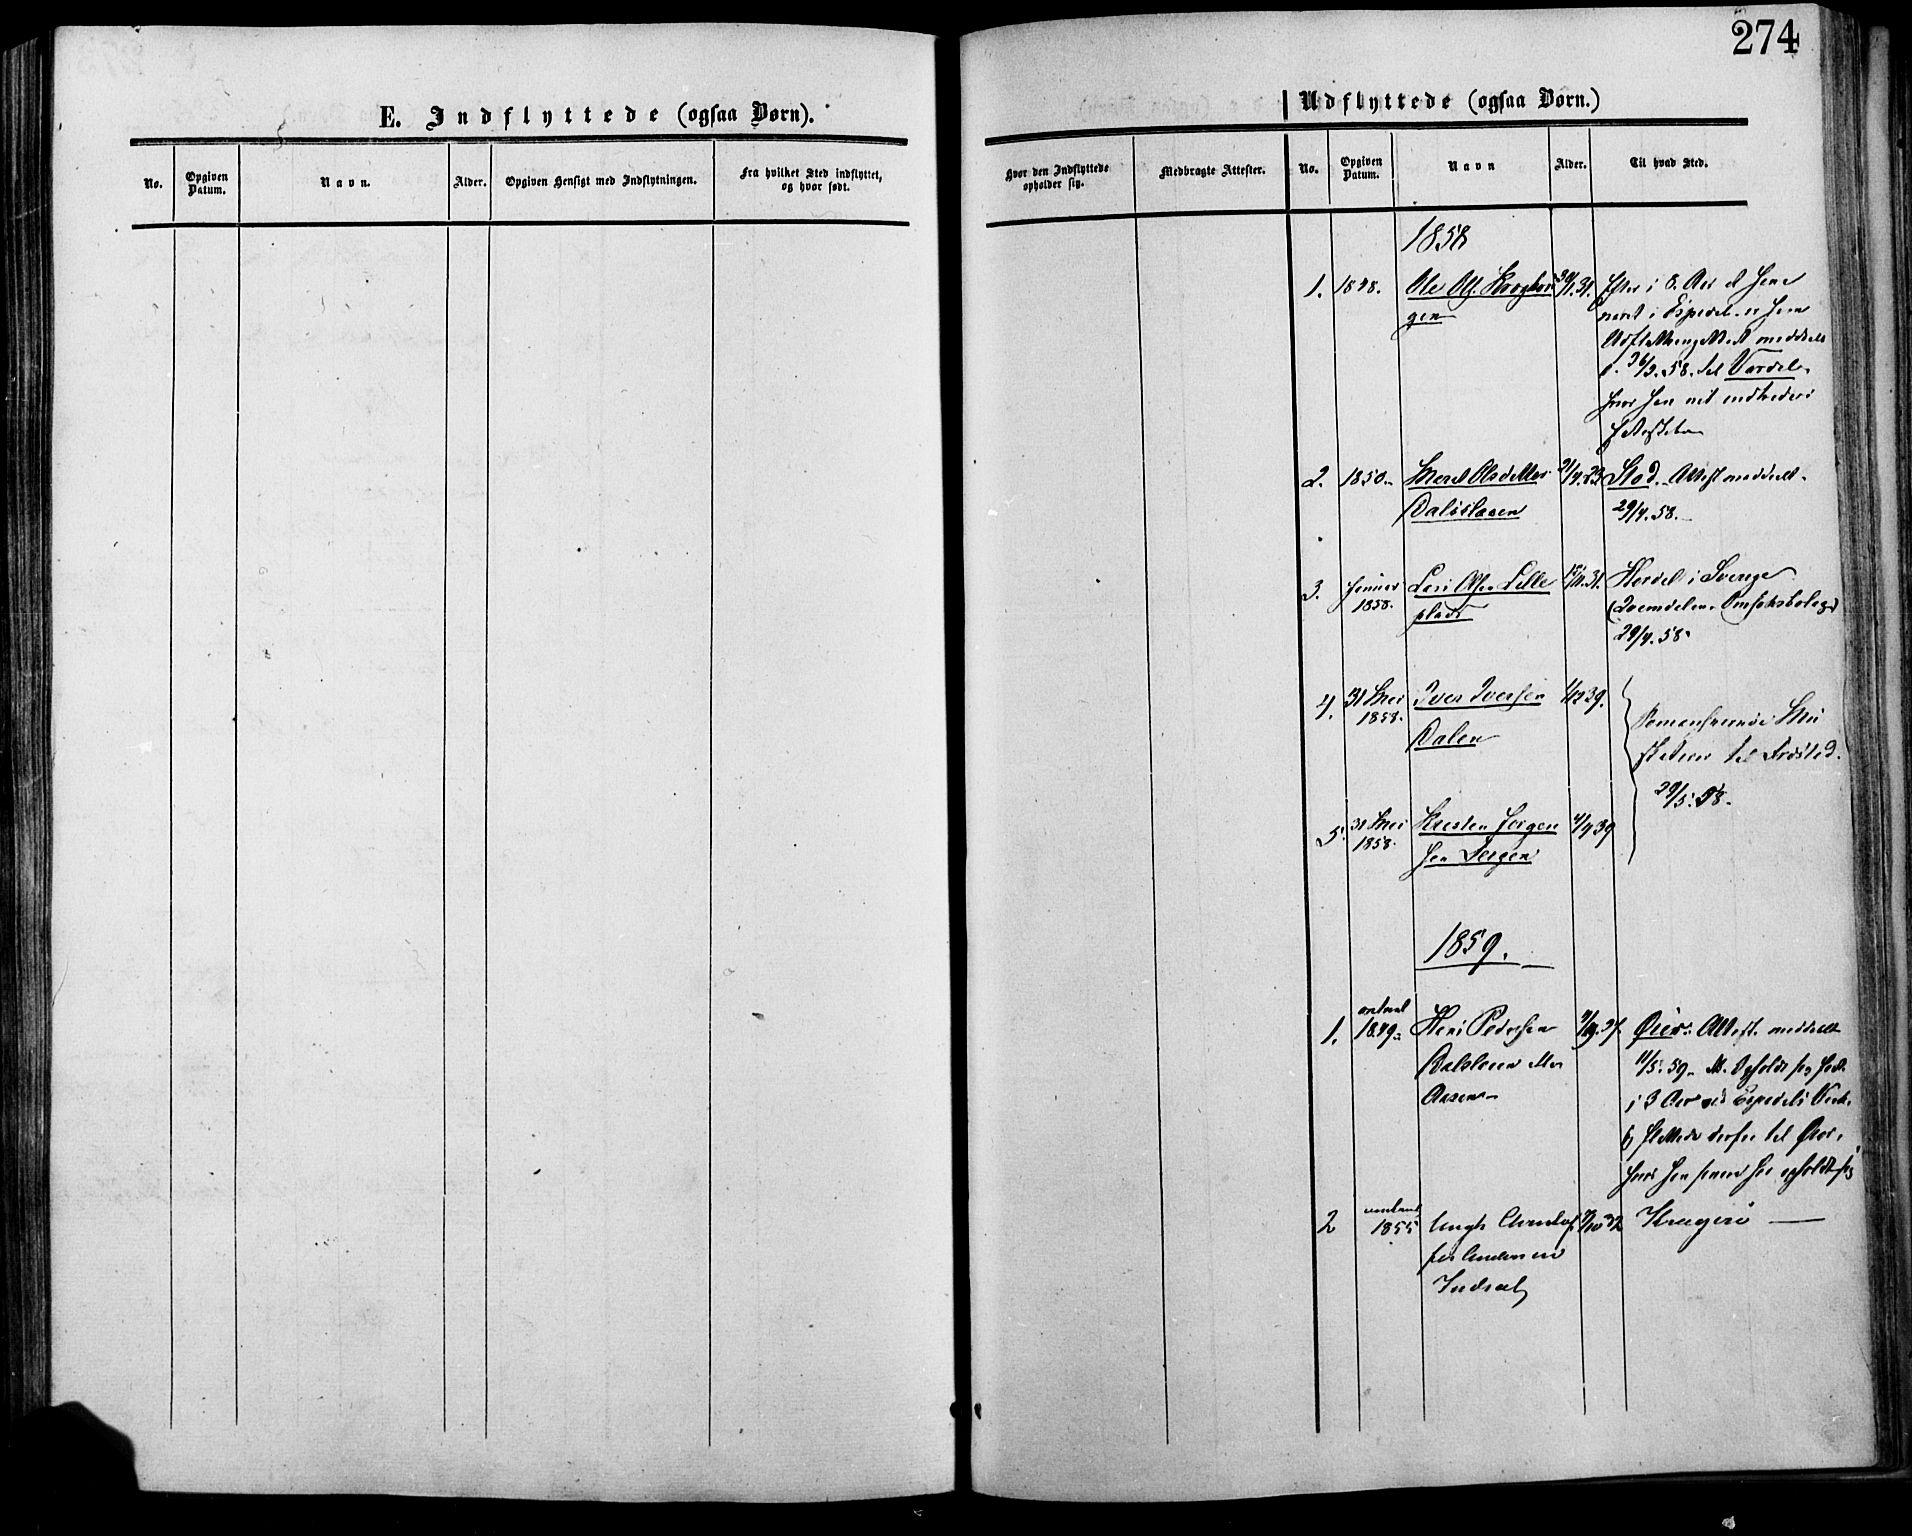 SAH, Lesja prestekontor, Ministerialbok nr. 7, 1854-1862, s. 274